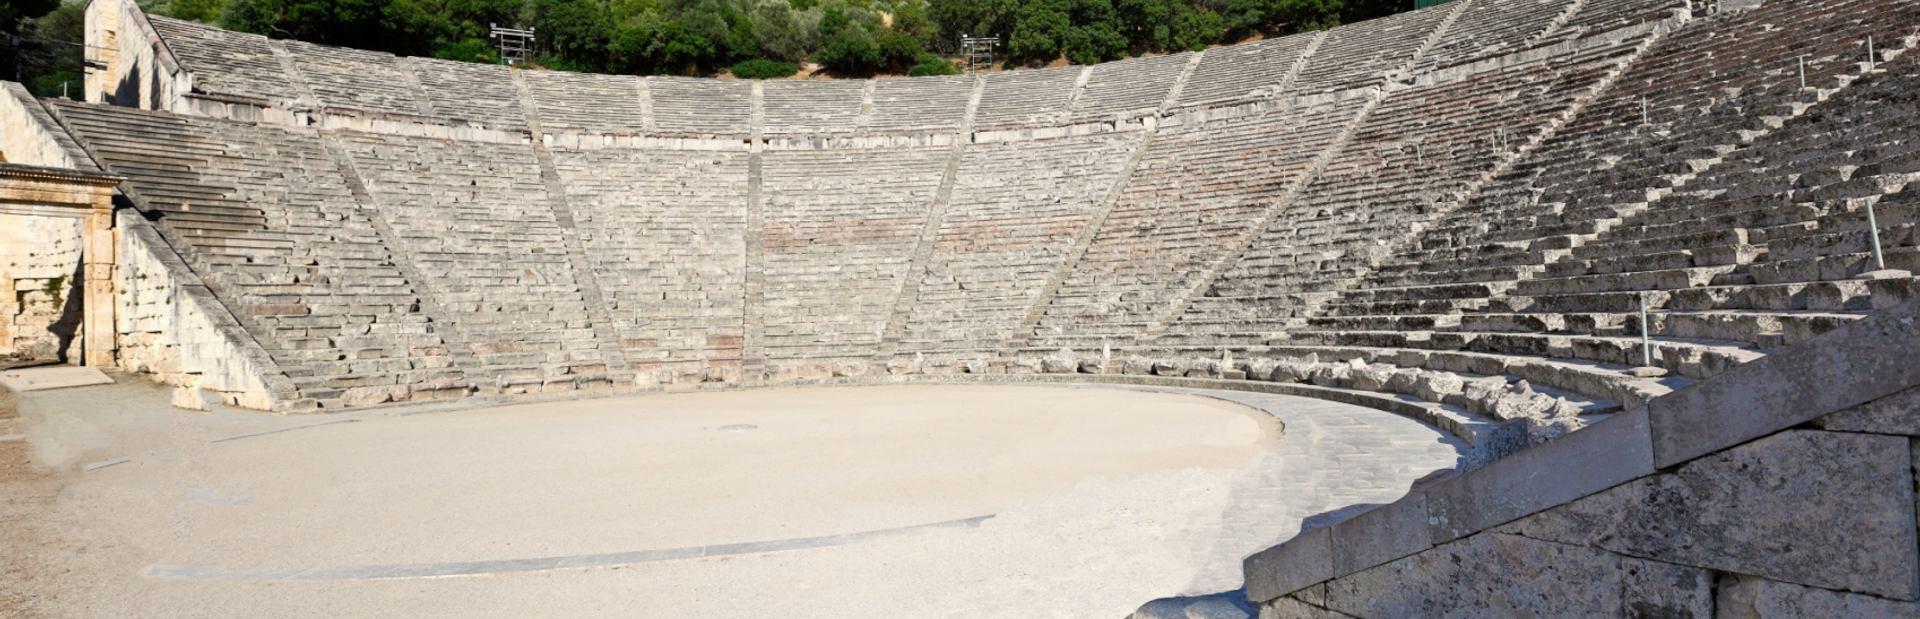 Epidavros guide